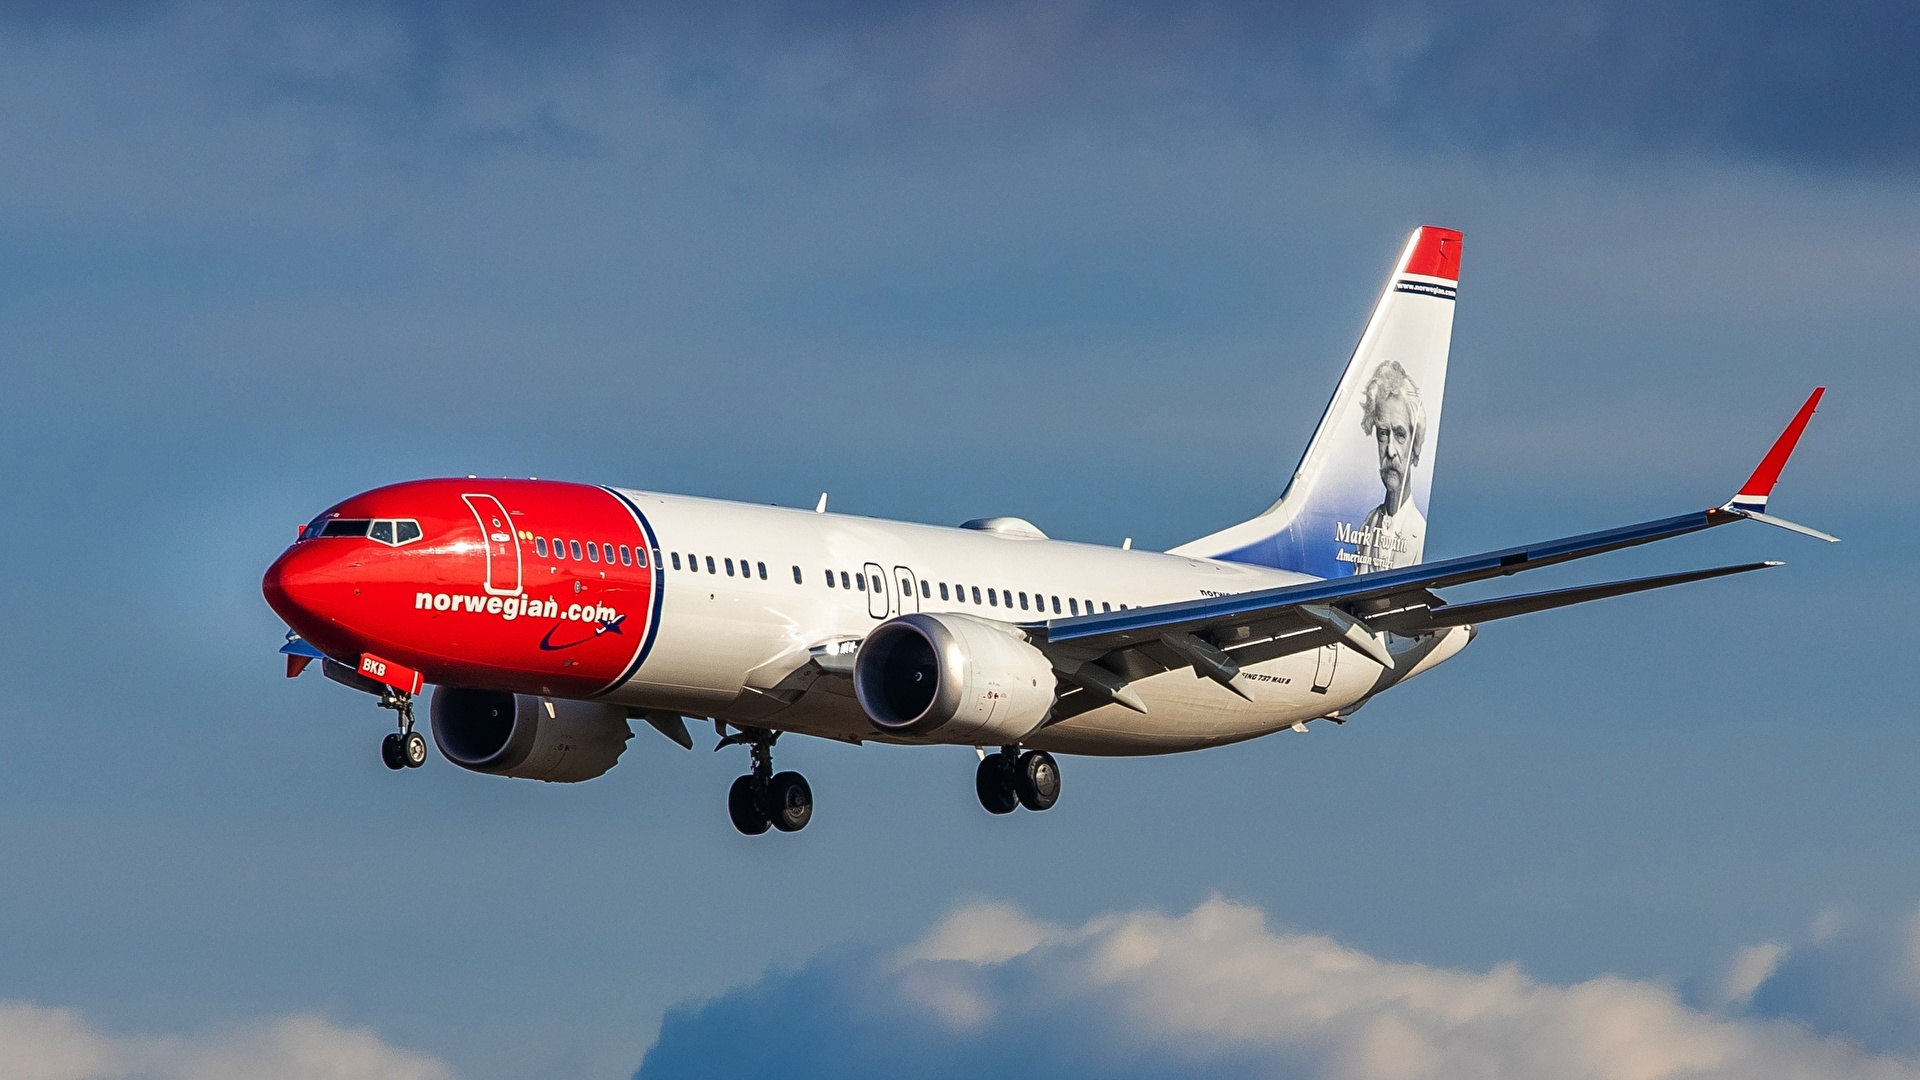 boeing 737 max norwegian air